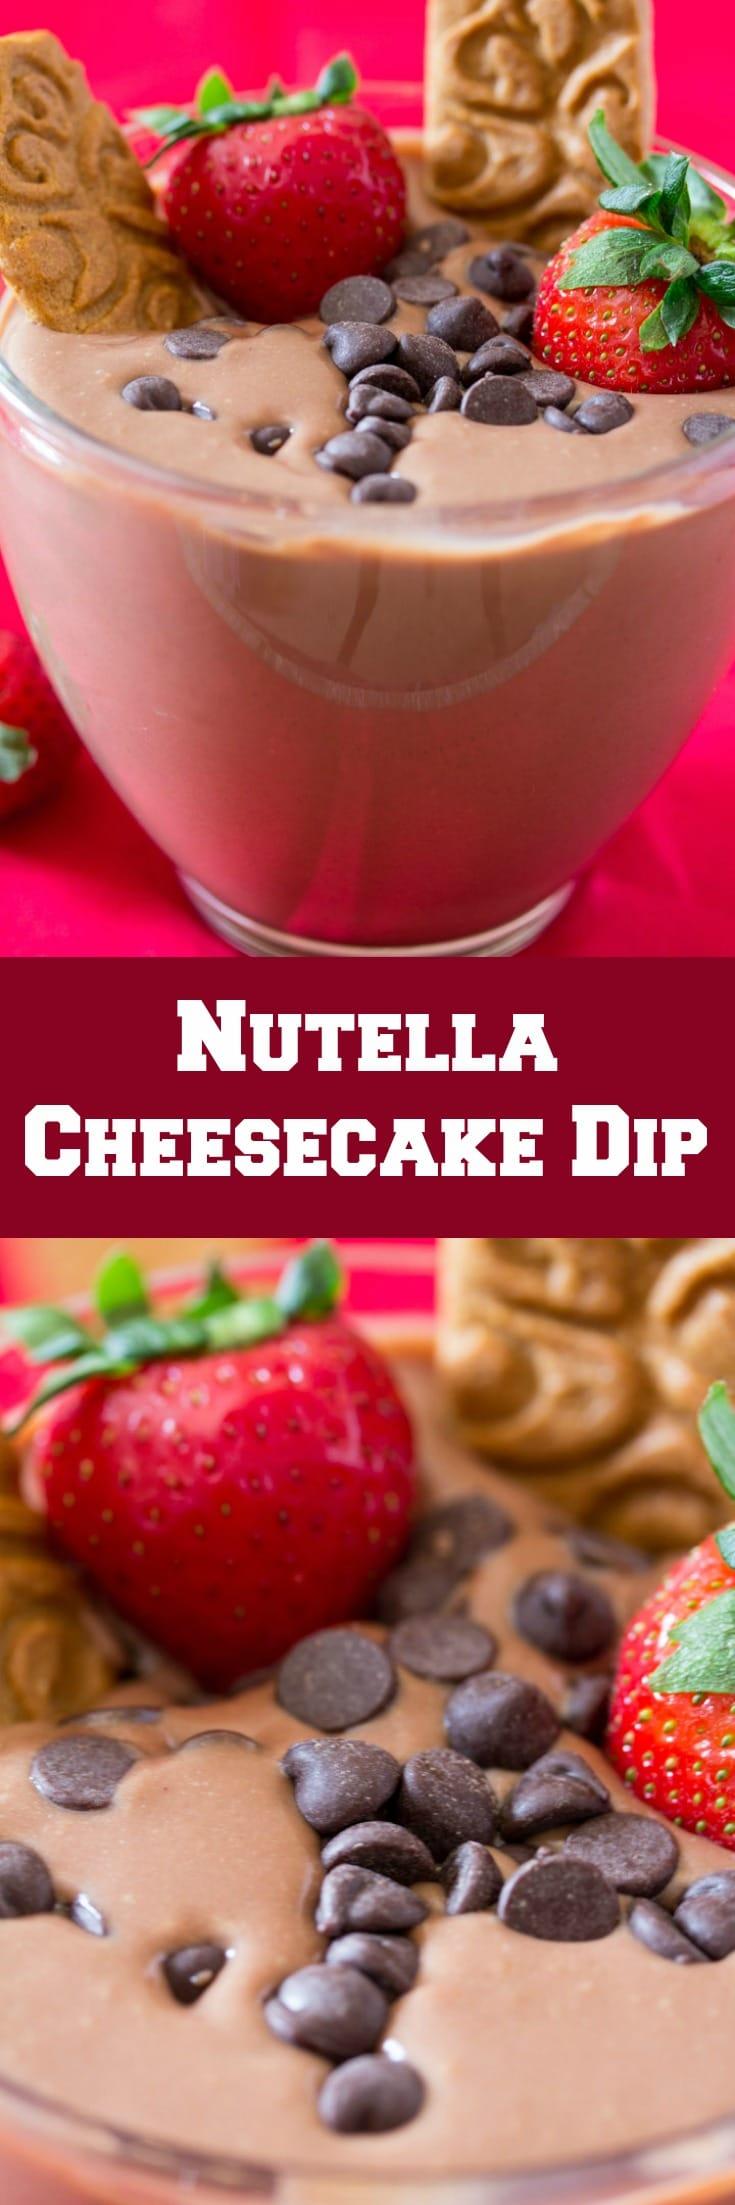 Five Minute Nutella Cheesecake Dip-4